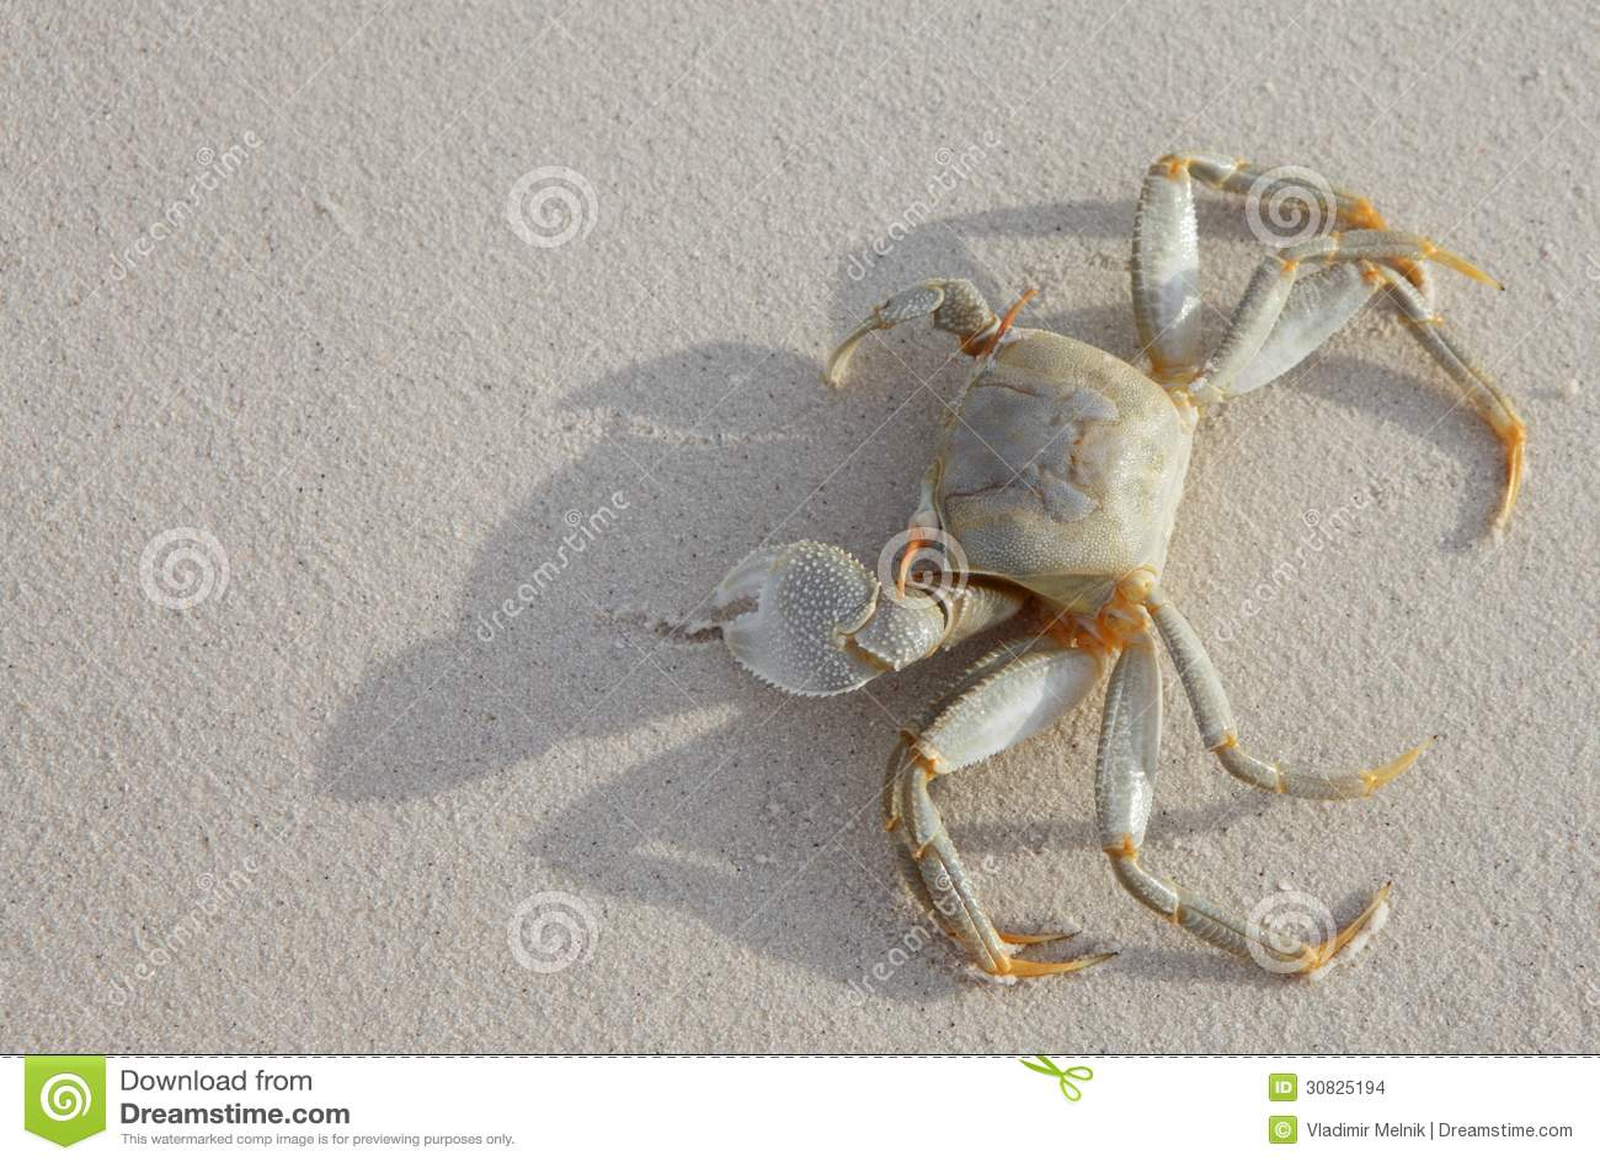 Crab on beach stock photo. Image of ocean, ocypode, animal ...